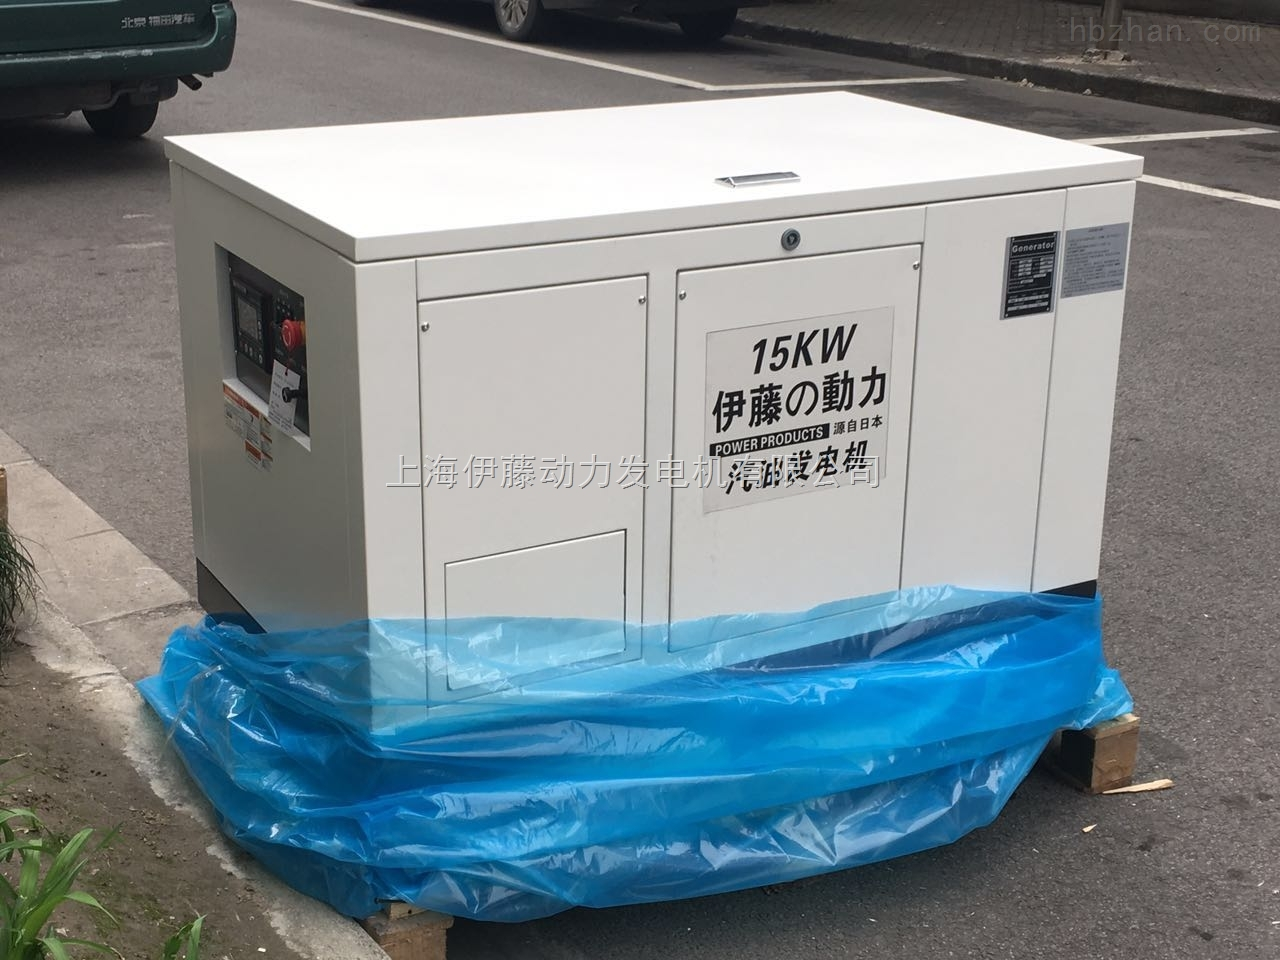 15kw机房专用汽油发电机